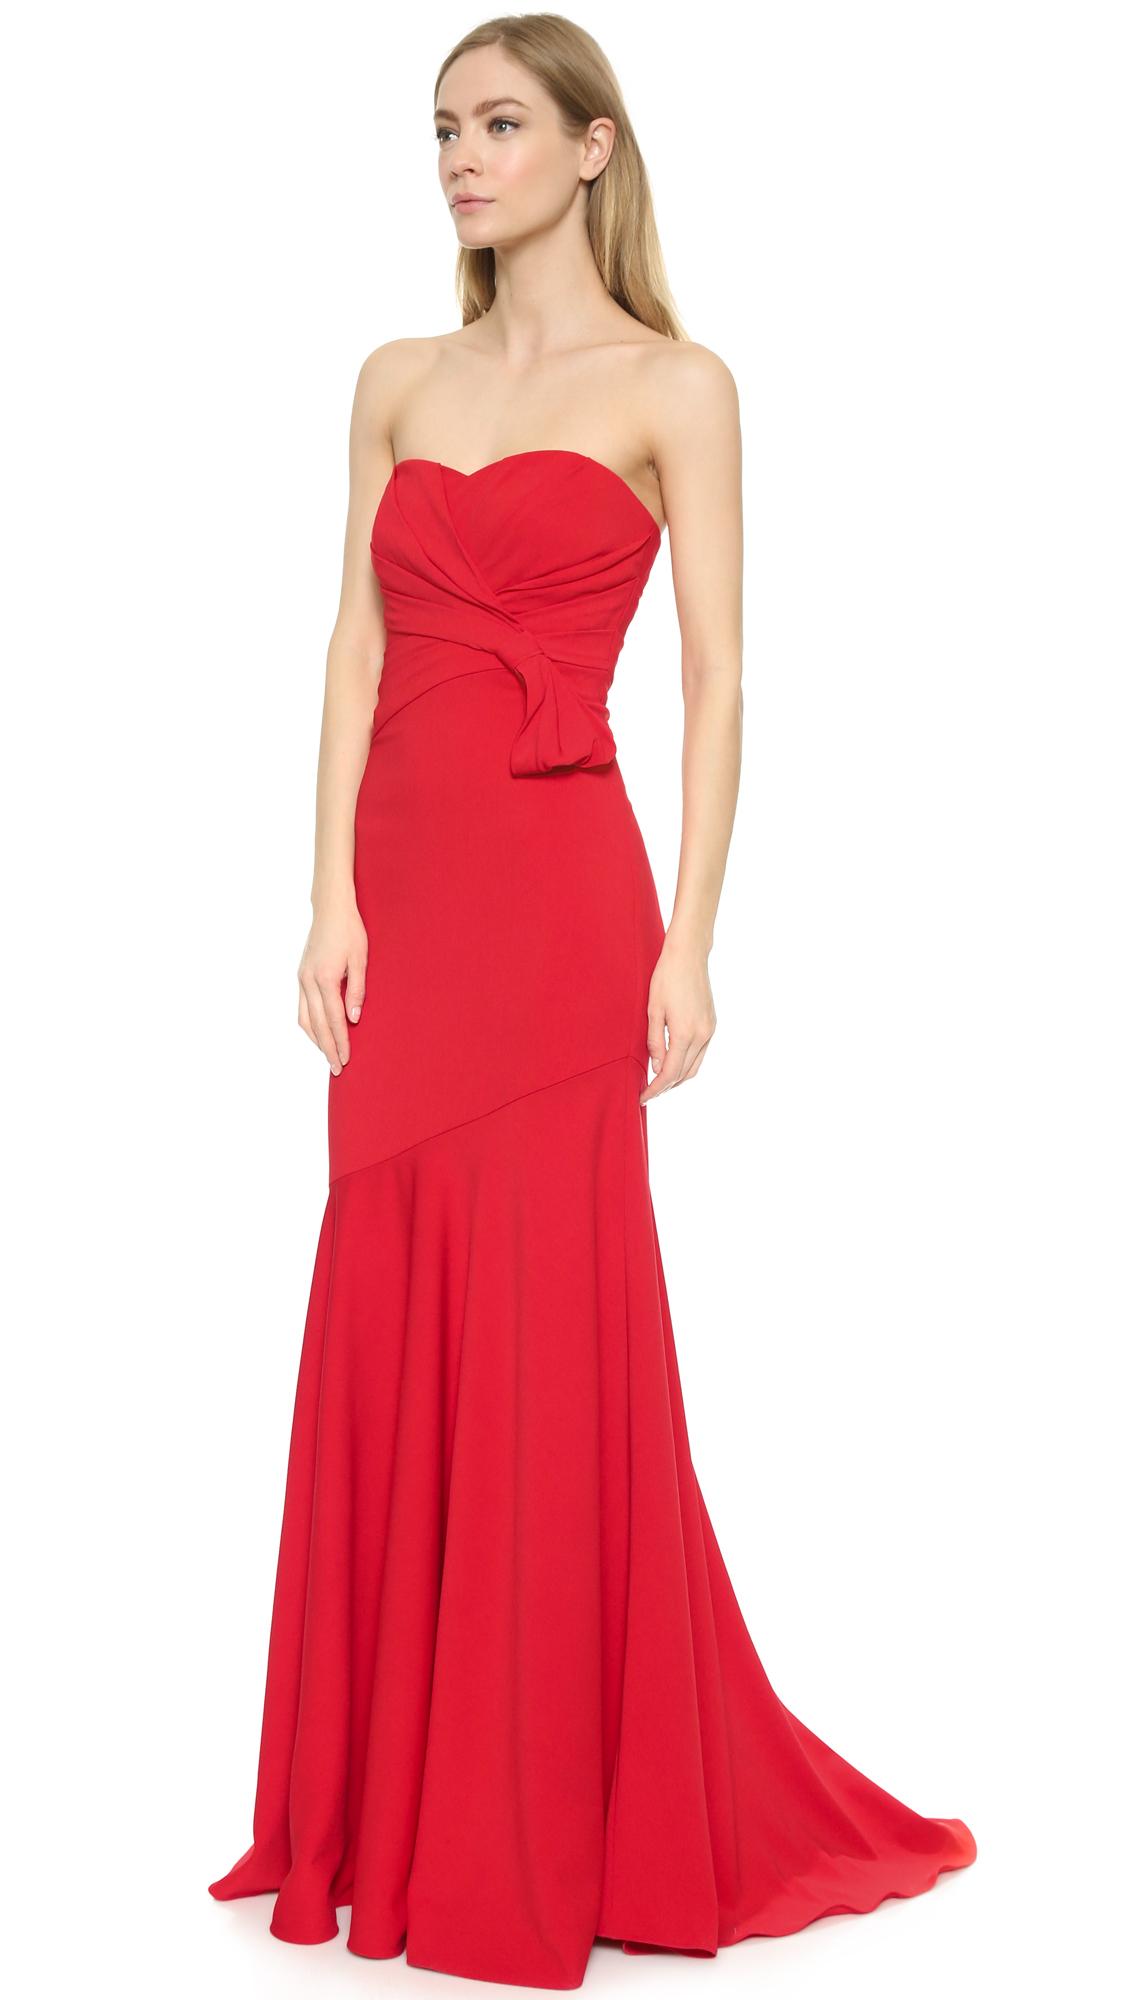 Badgley Mischka Red Dress – fashion dresses